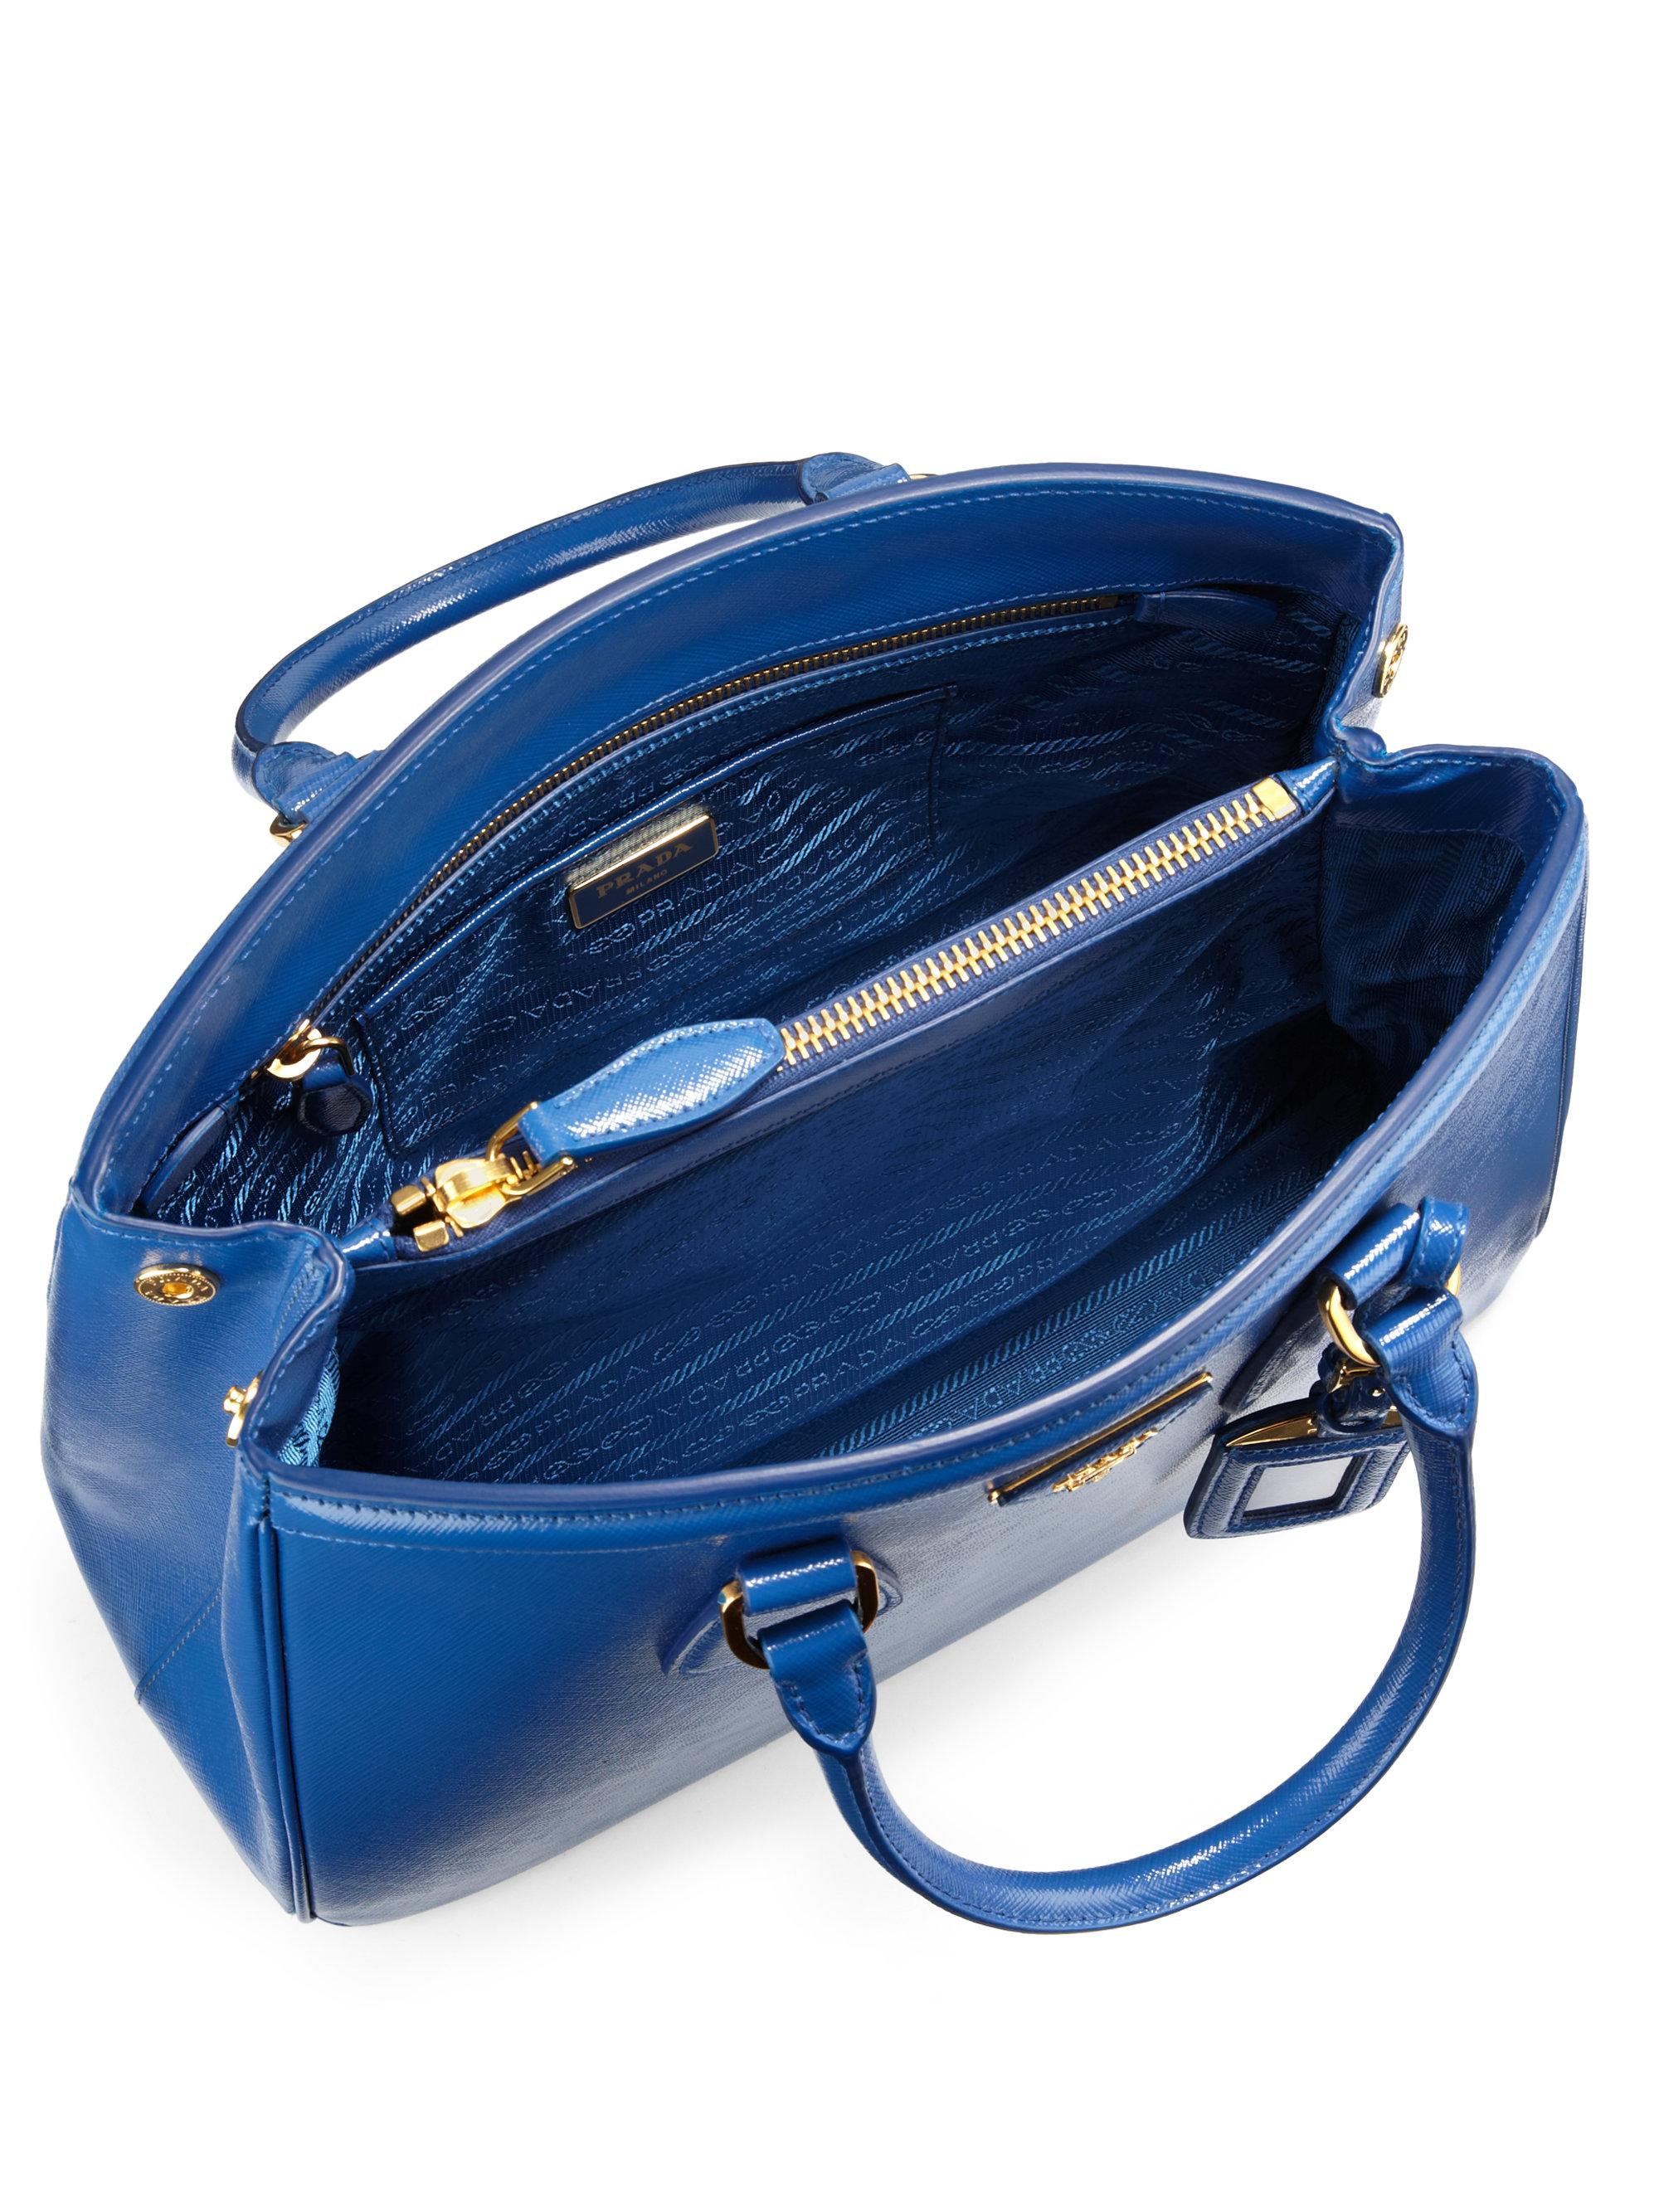 baby pink prada bag - prada blue saffiano leather travel tote, red prada tote